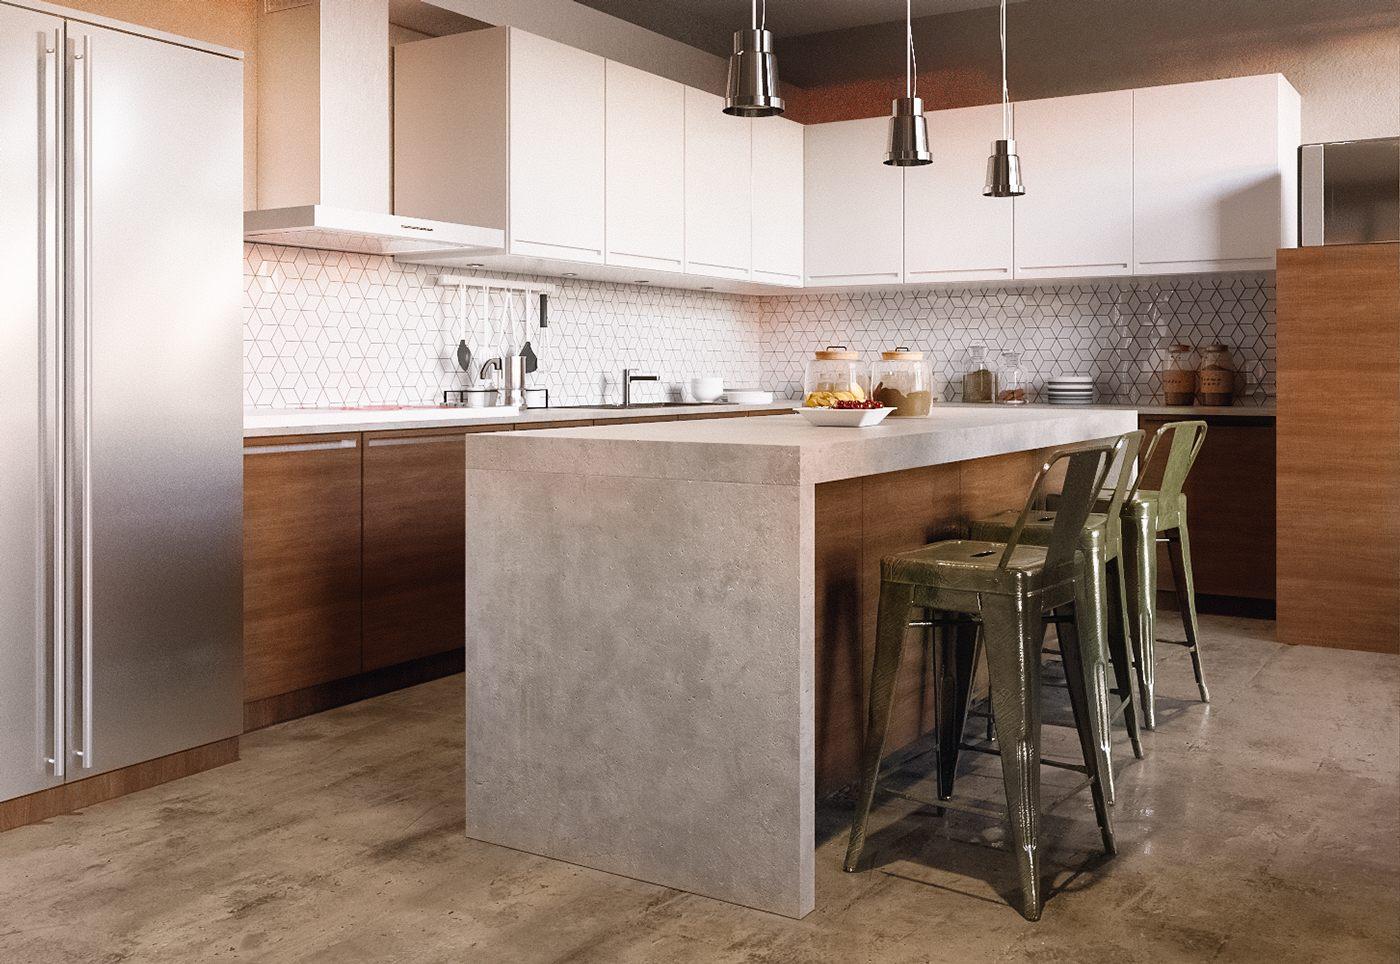 simple modern kitchen-barstools